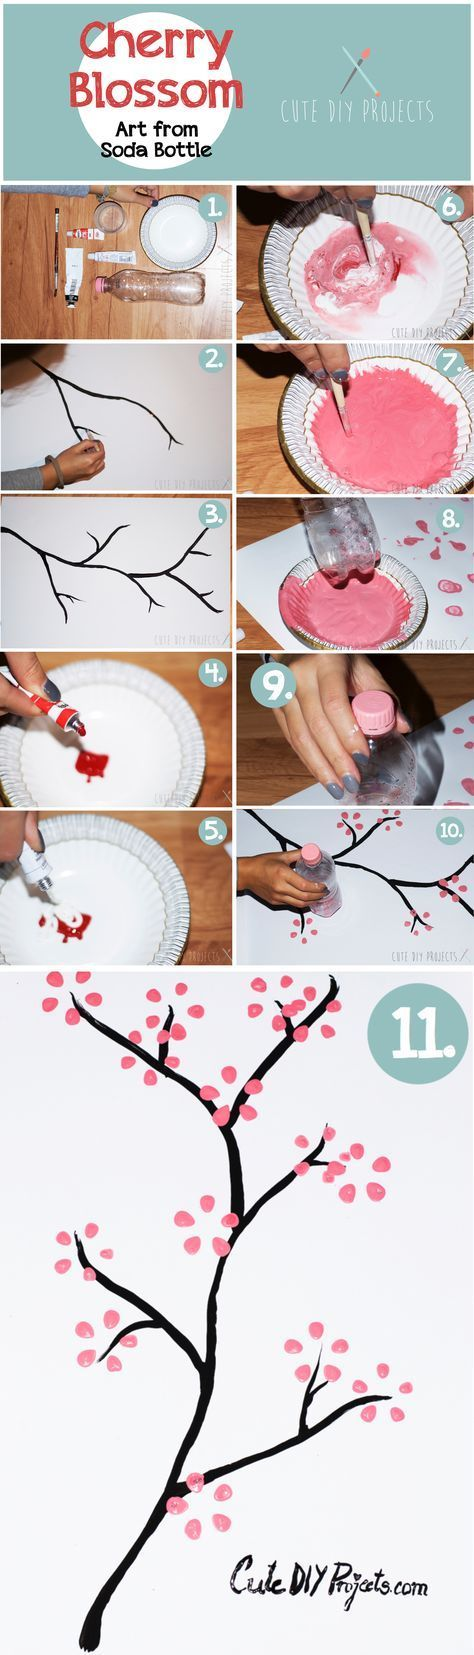 Trendy Cherry Blossom Tree Painting Art Soda Bottles Ideas Art Blossom Bottles Cherry Ideas Painting So Cherry Blossom Art Blossoms Art Cute Diy Projects